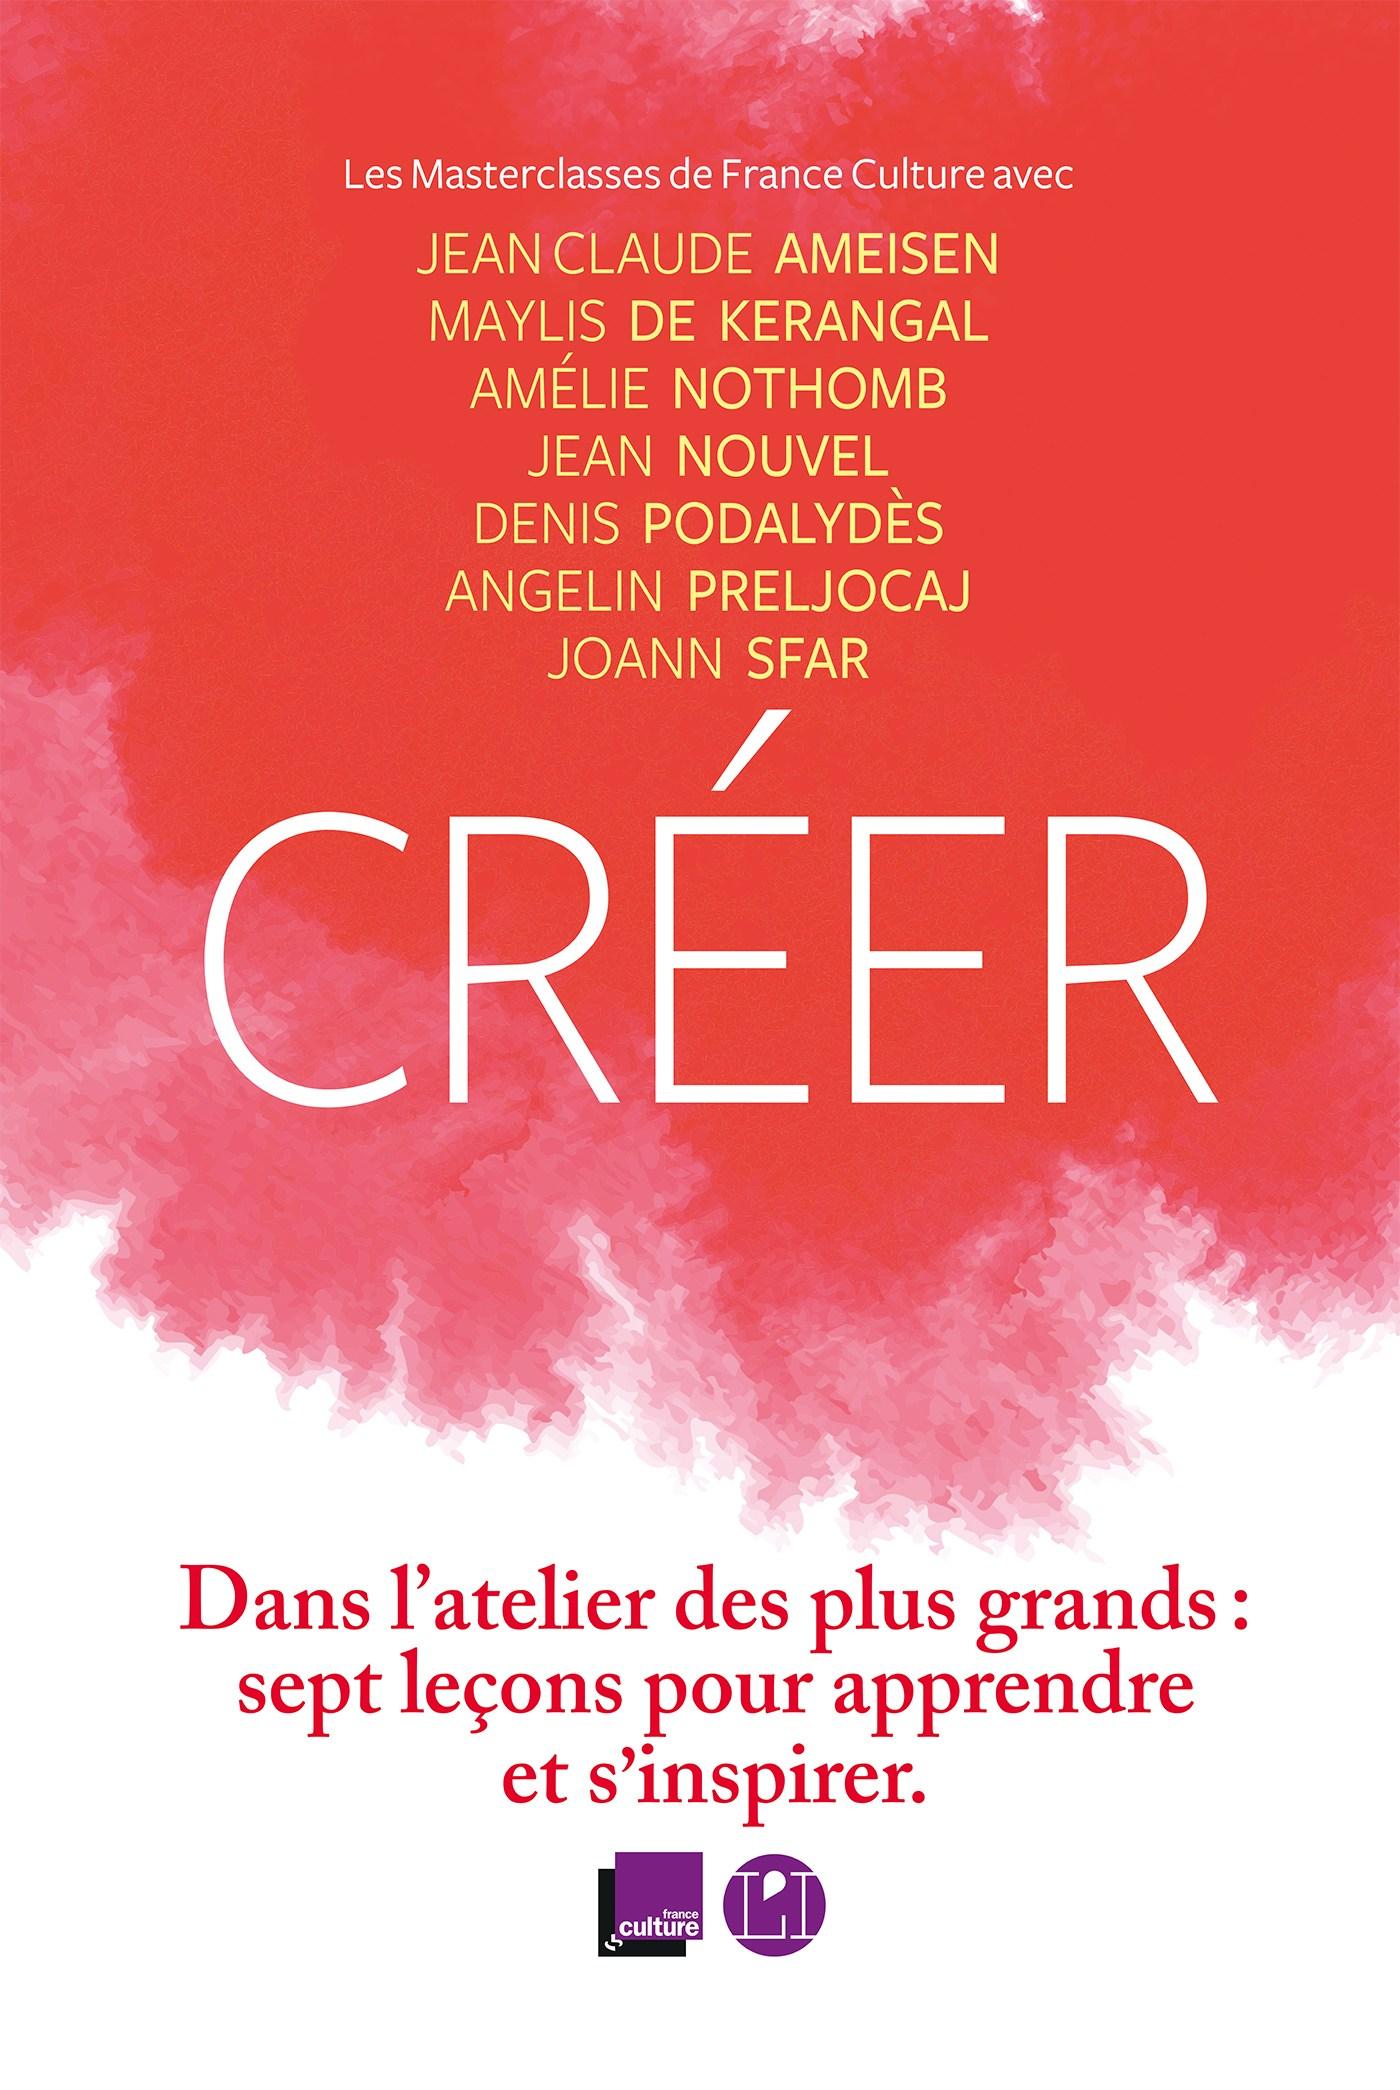 Créer. Les masterclass de France Culture